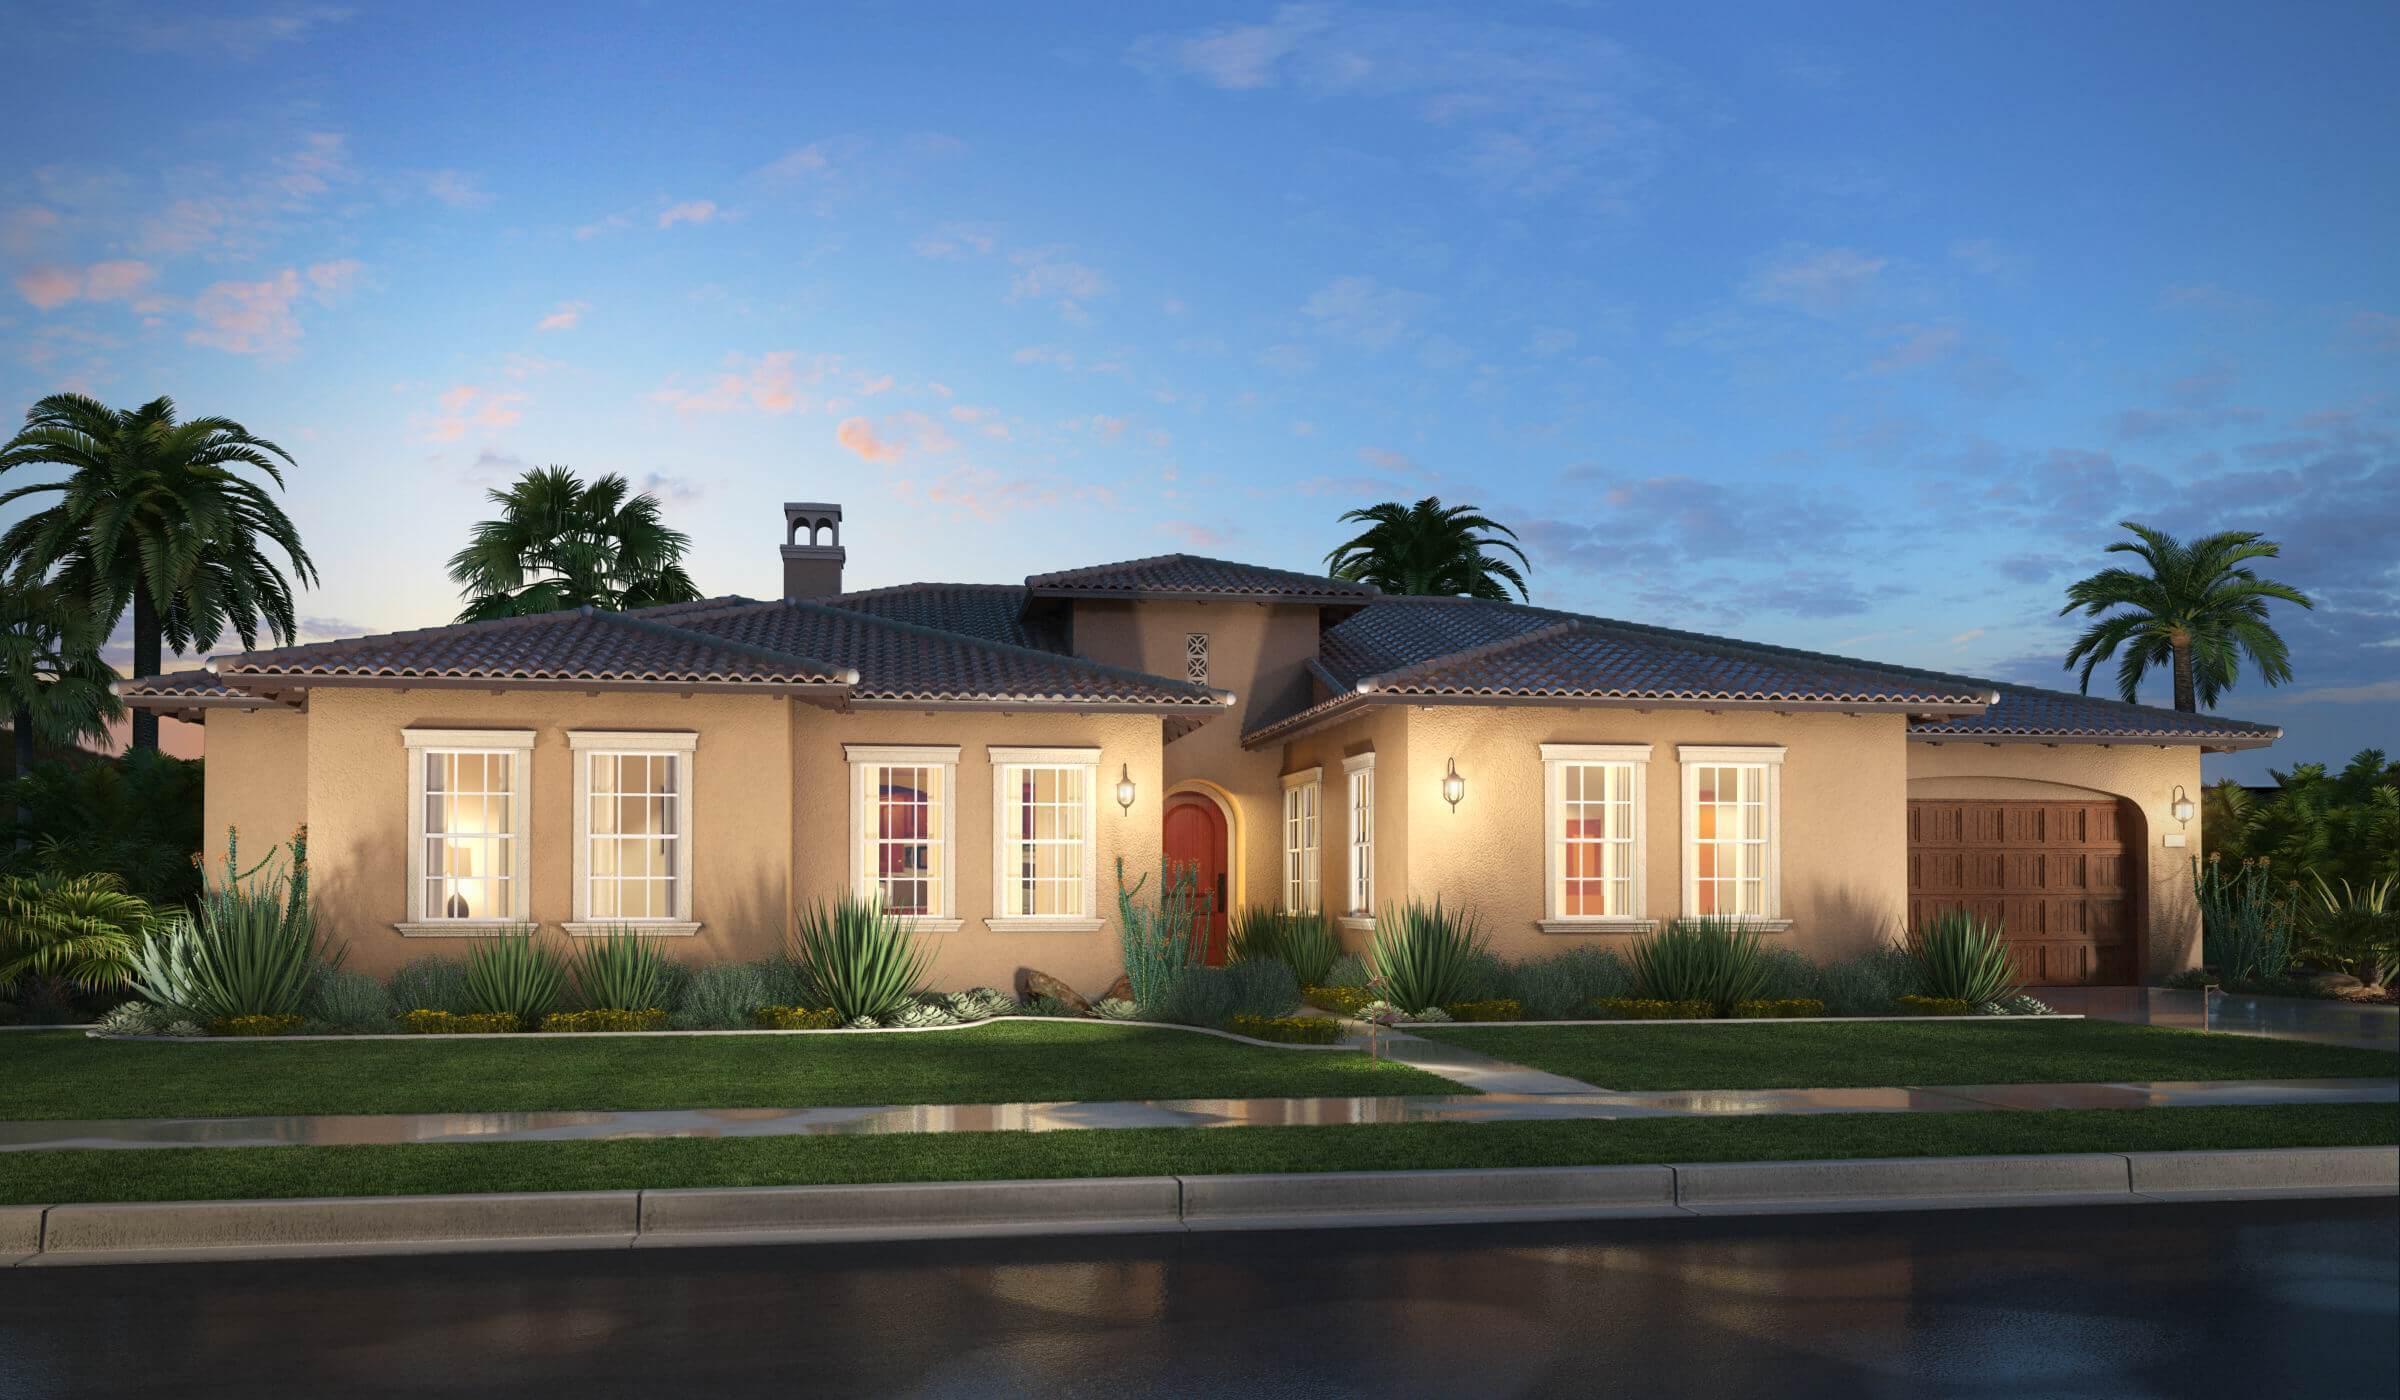 Single Family for Sale at La Colina Estates - Residence 3 1203 Iris Lane Glendora, California 91741 United States